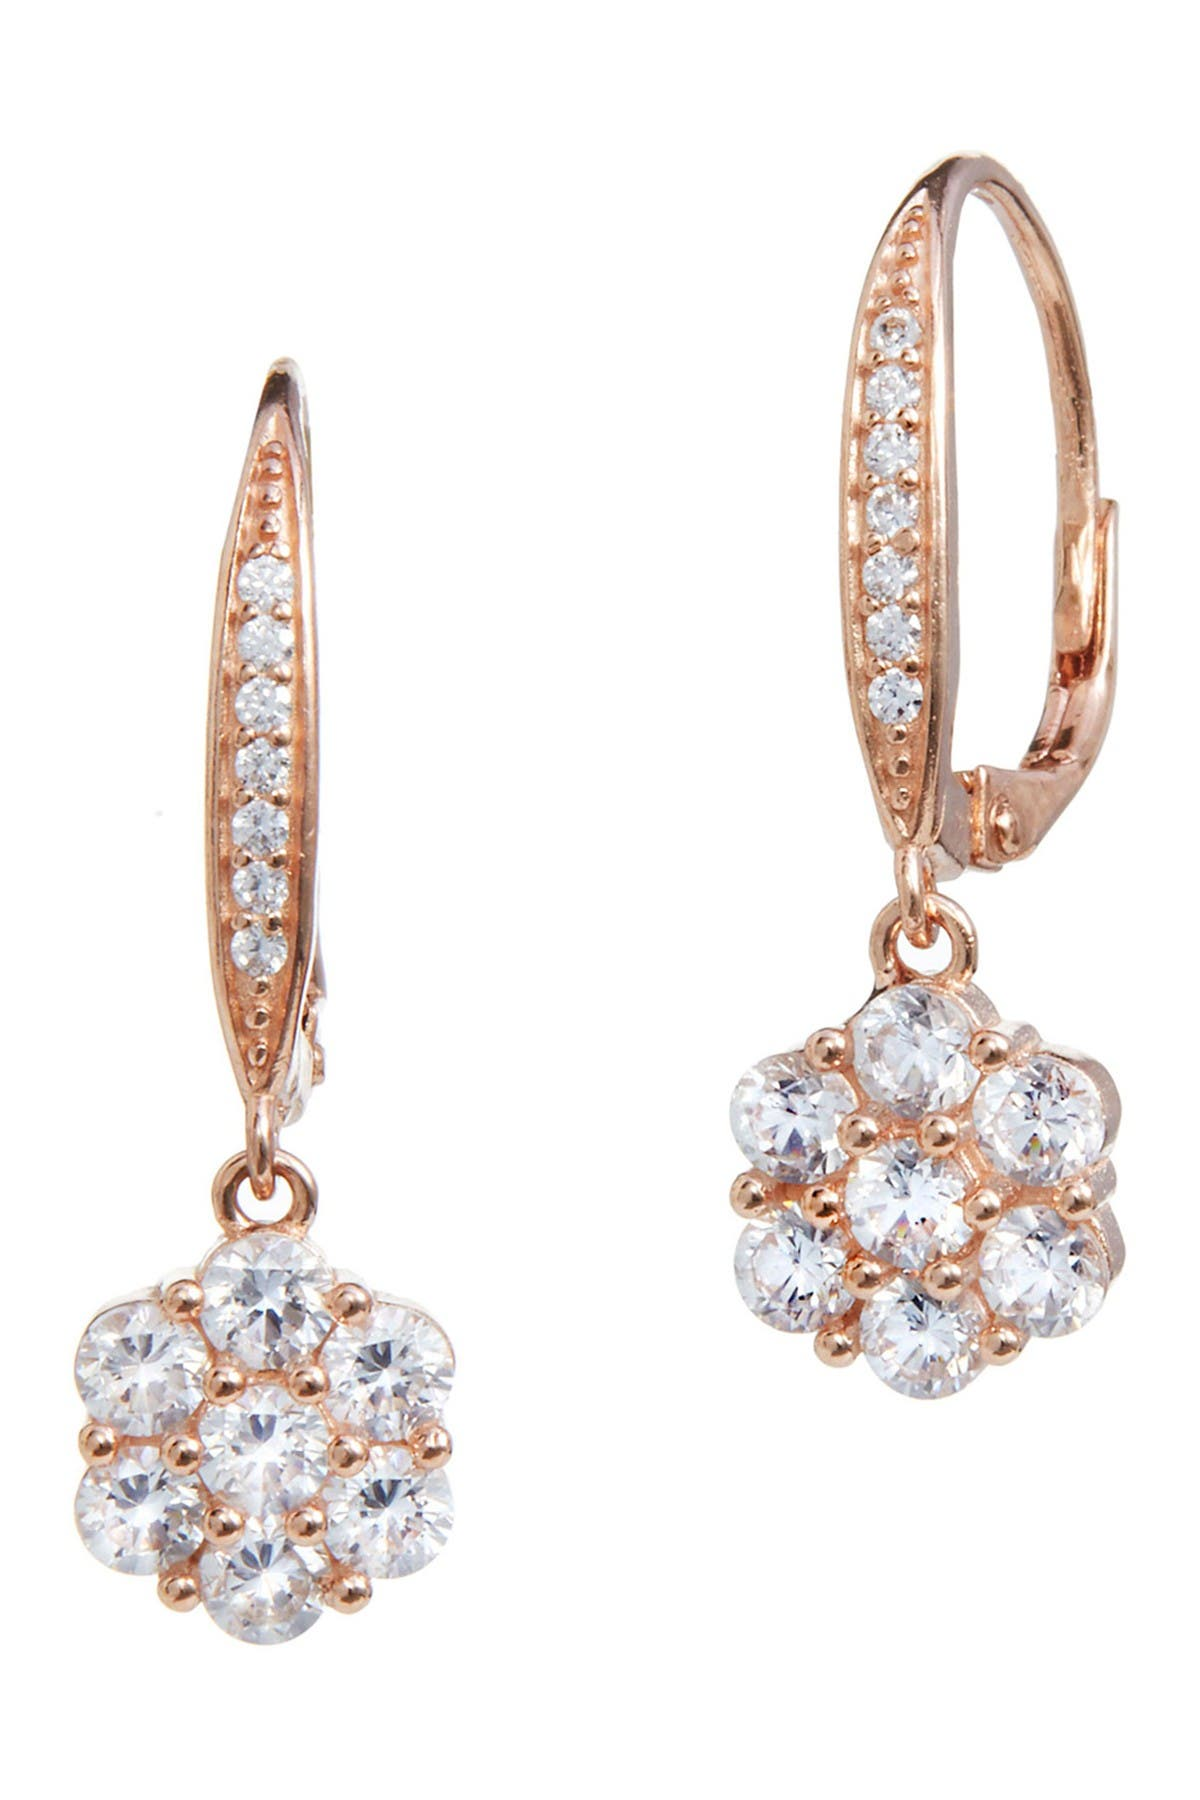 Image of Savvy Cie 18K Rose Gold Vermeil Sterling Silver CZ Drop Earrings